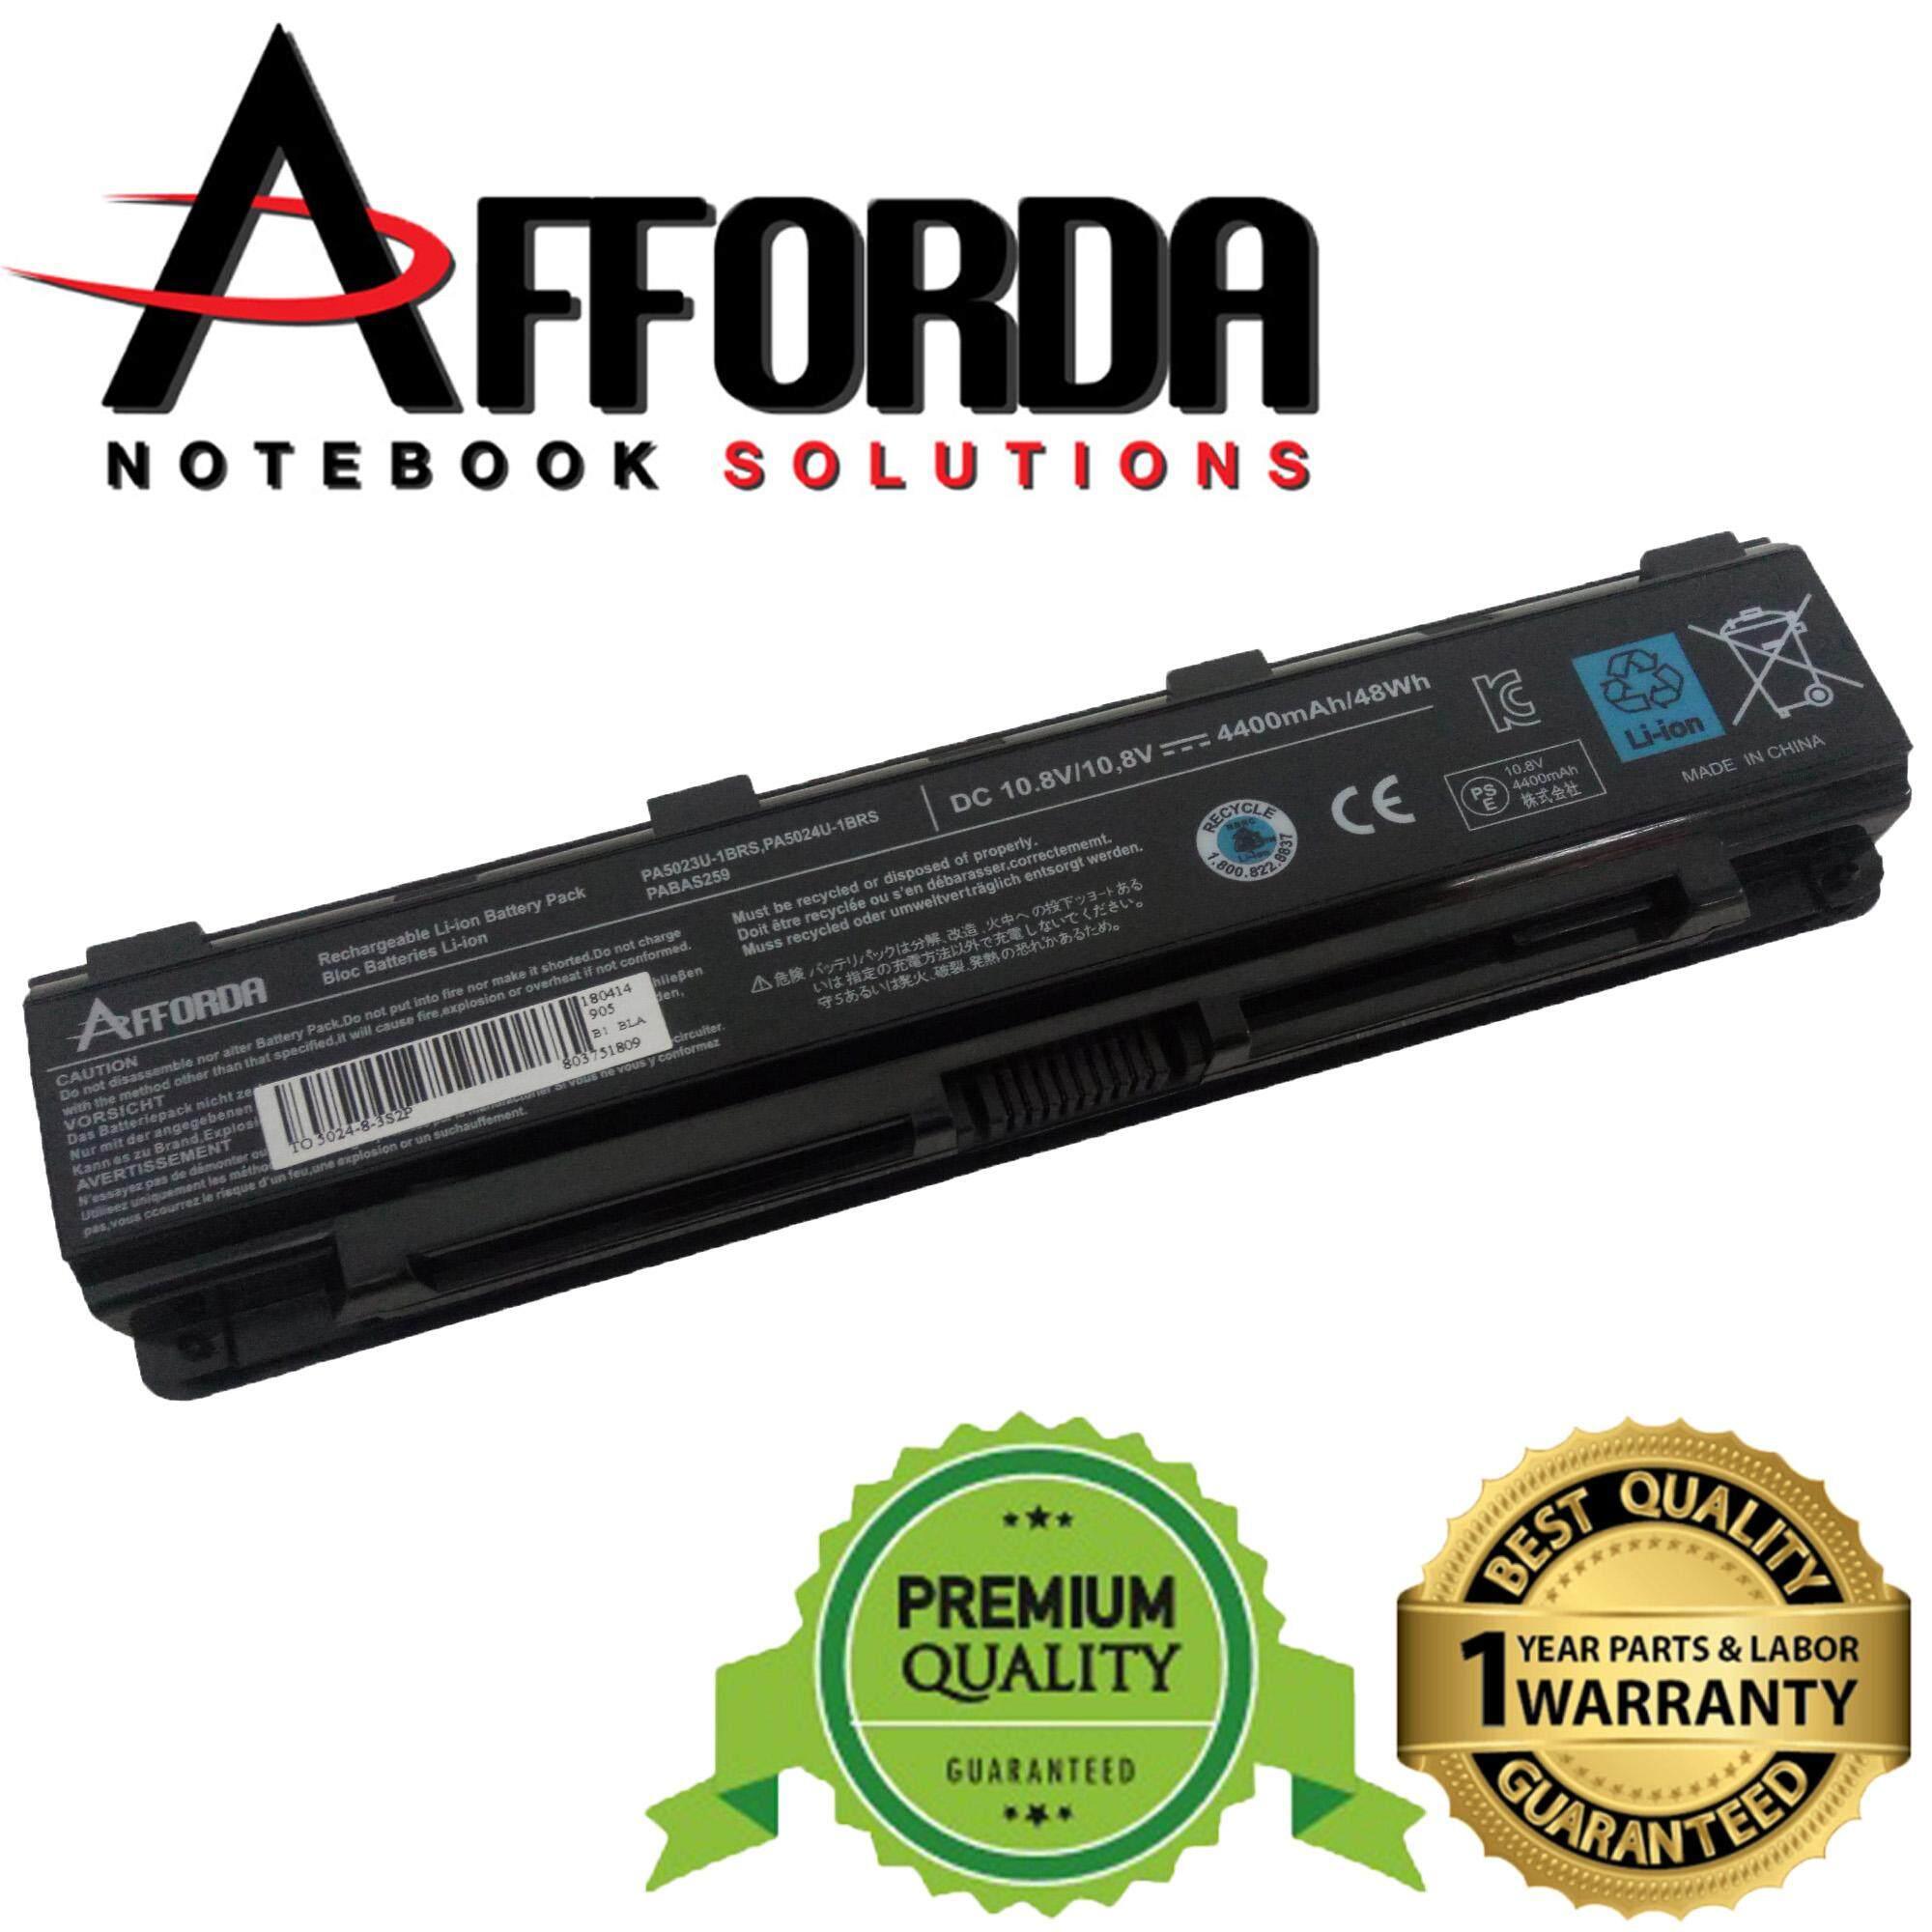 Toshiba PA5024 Notebook Laptop Battery